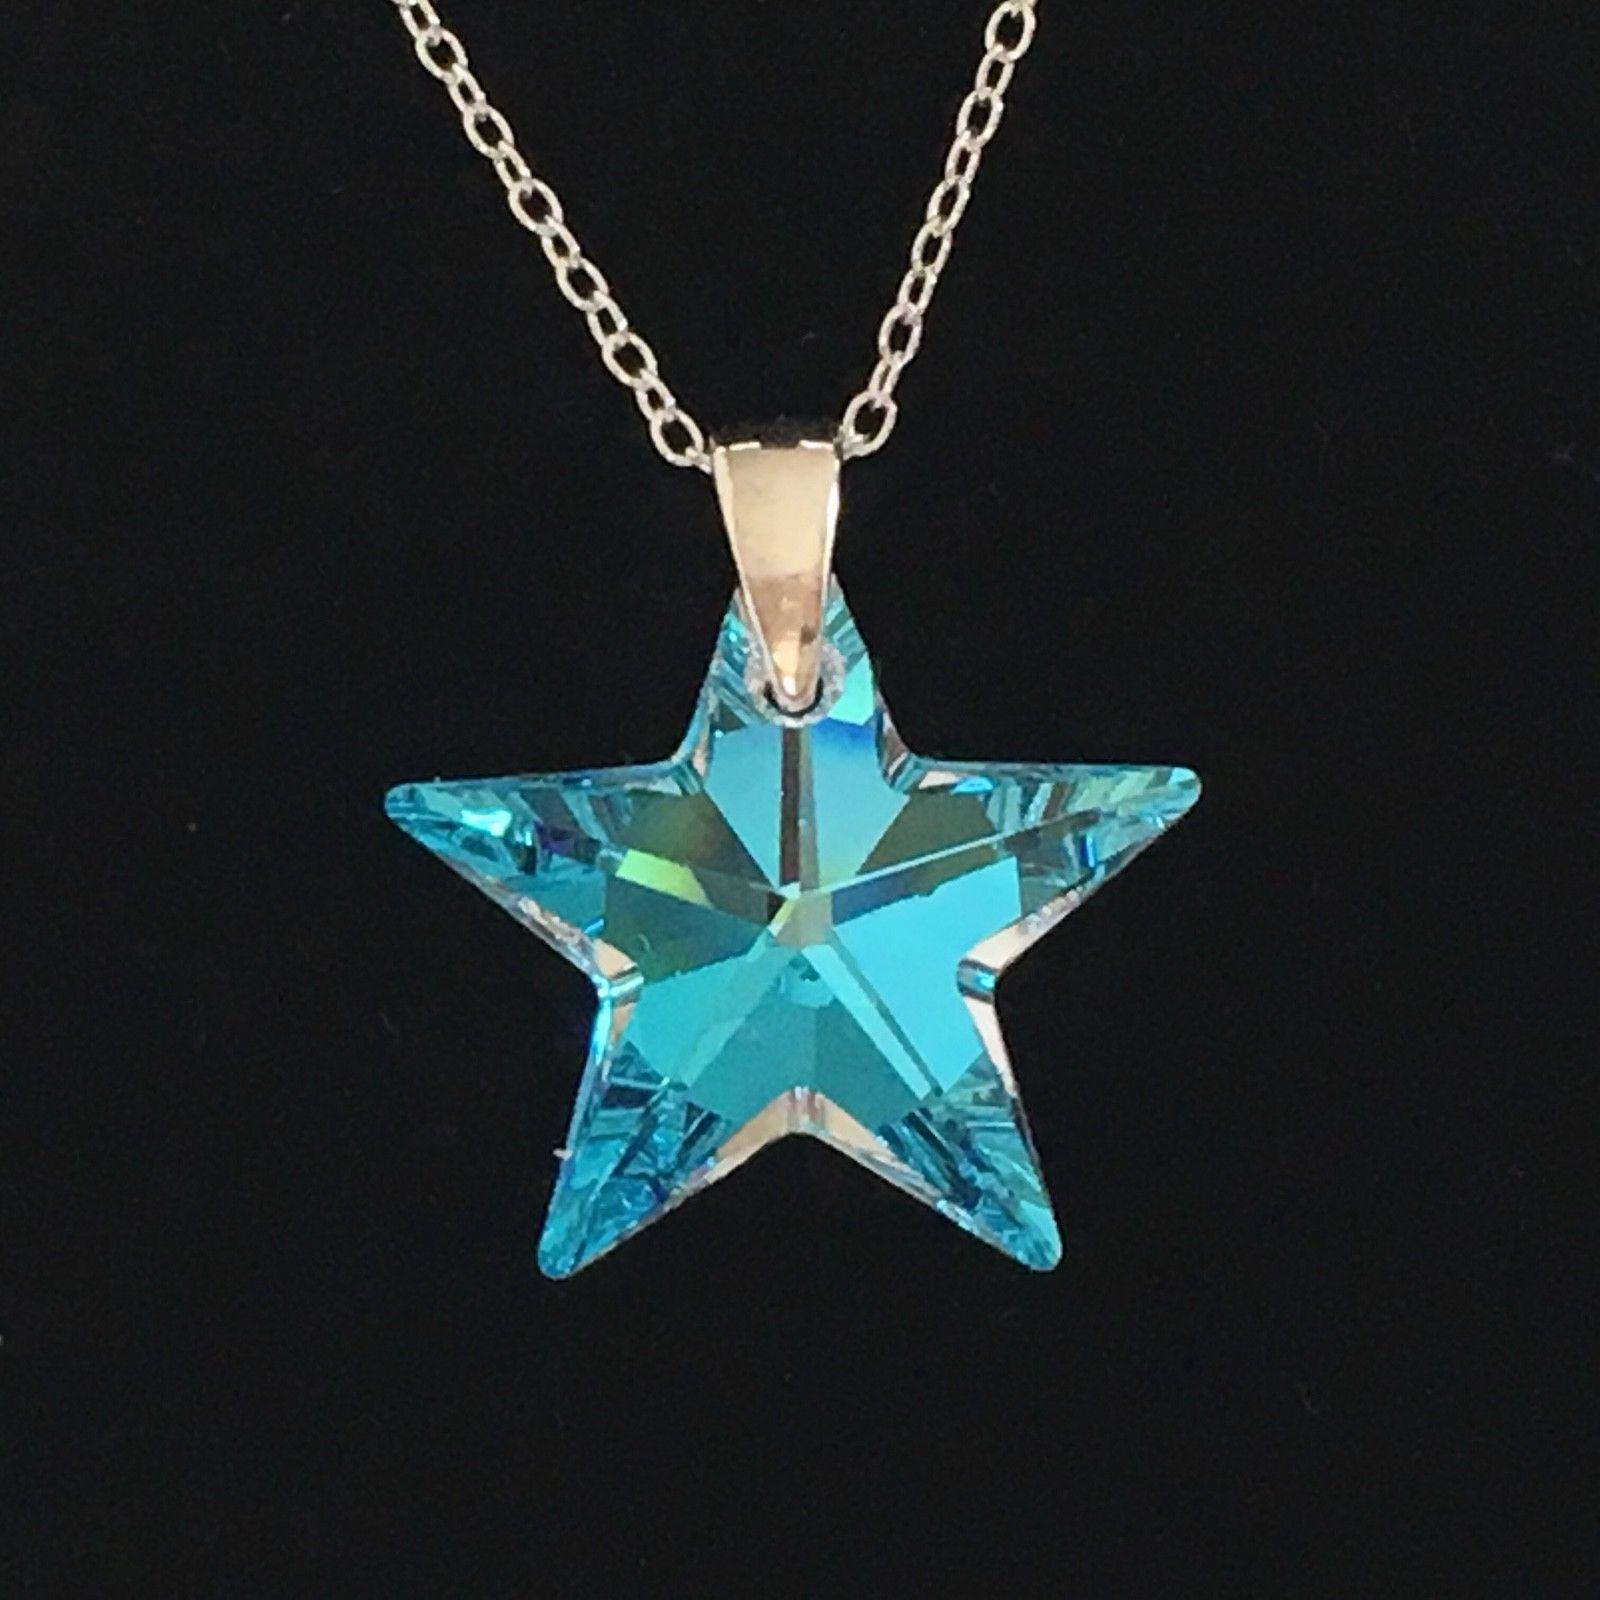 Swarovski Elements Blue Ab Star Crystal Elegance